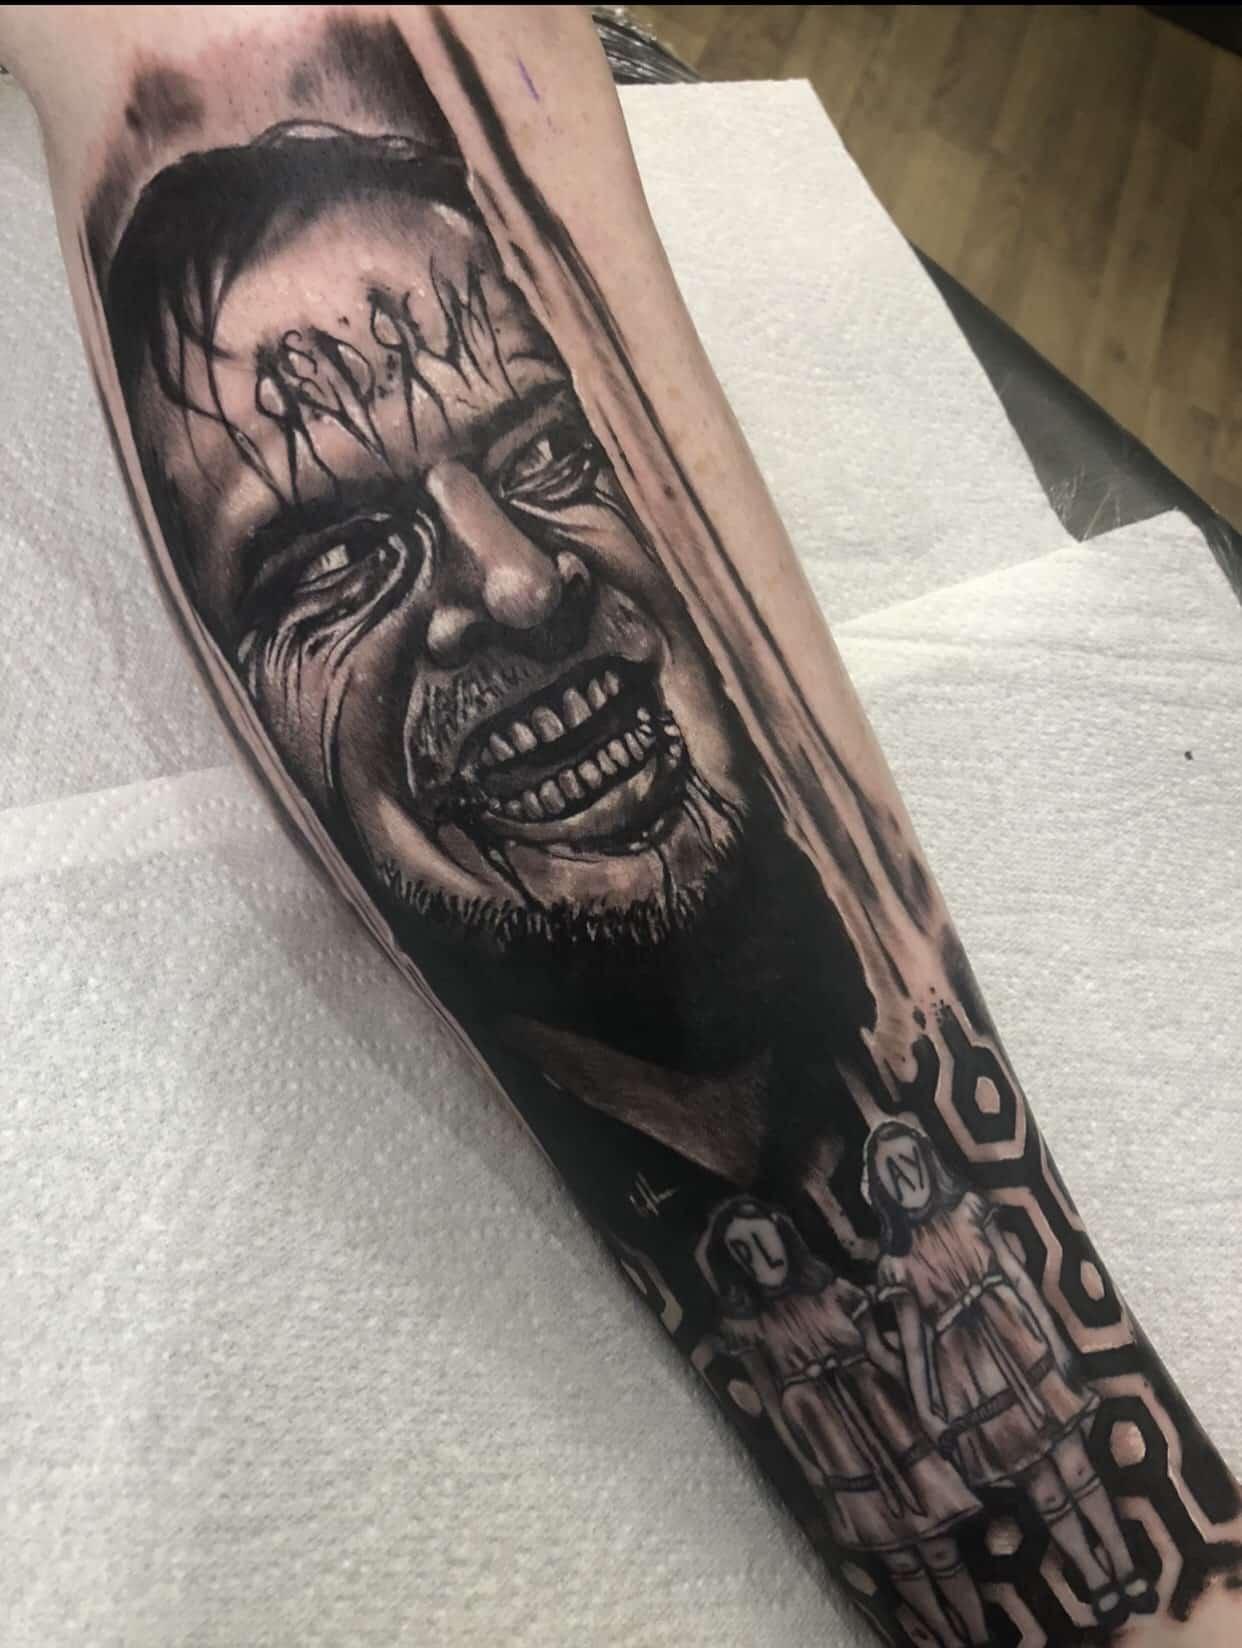 lowri-elizabeth-rogers-cardiff-tattoo-artist-jack-nicholson